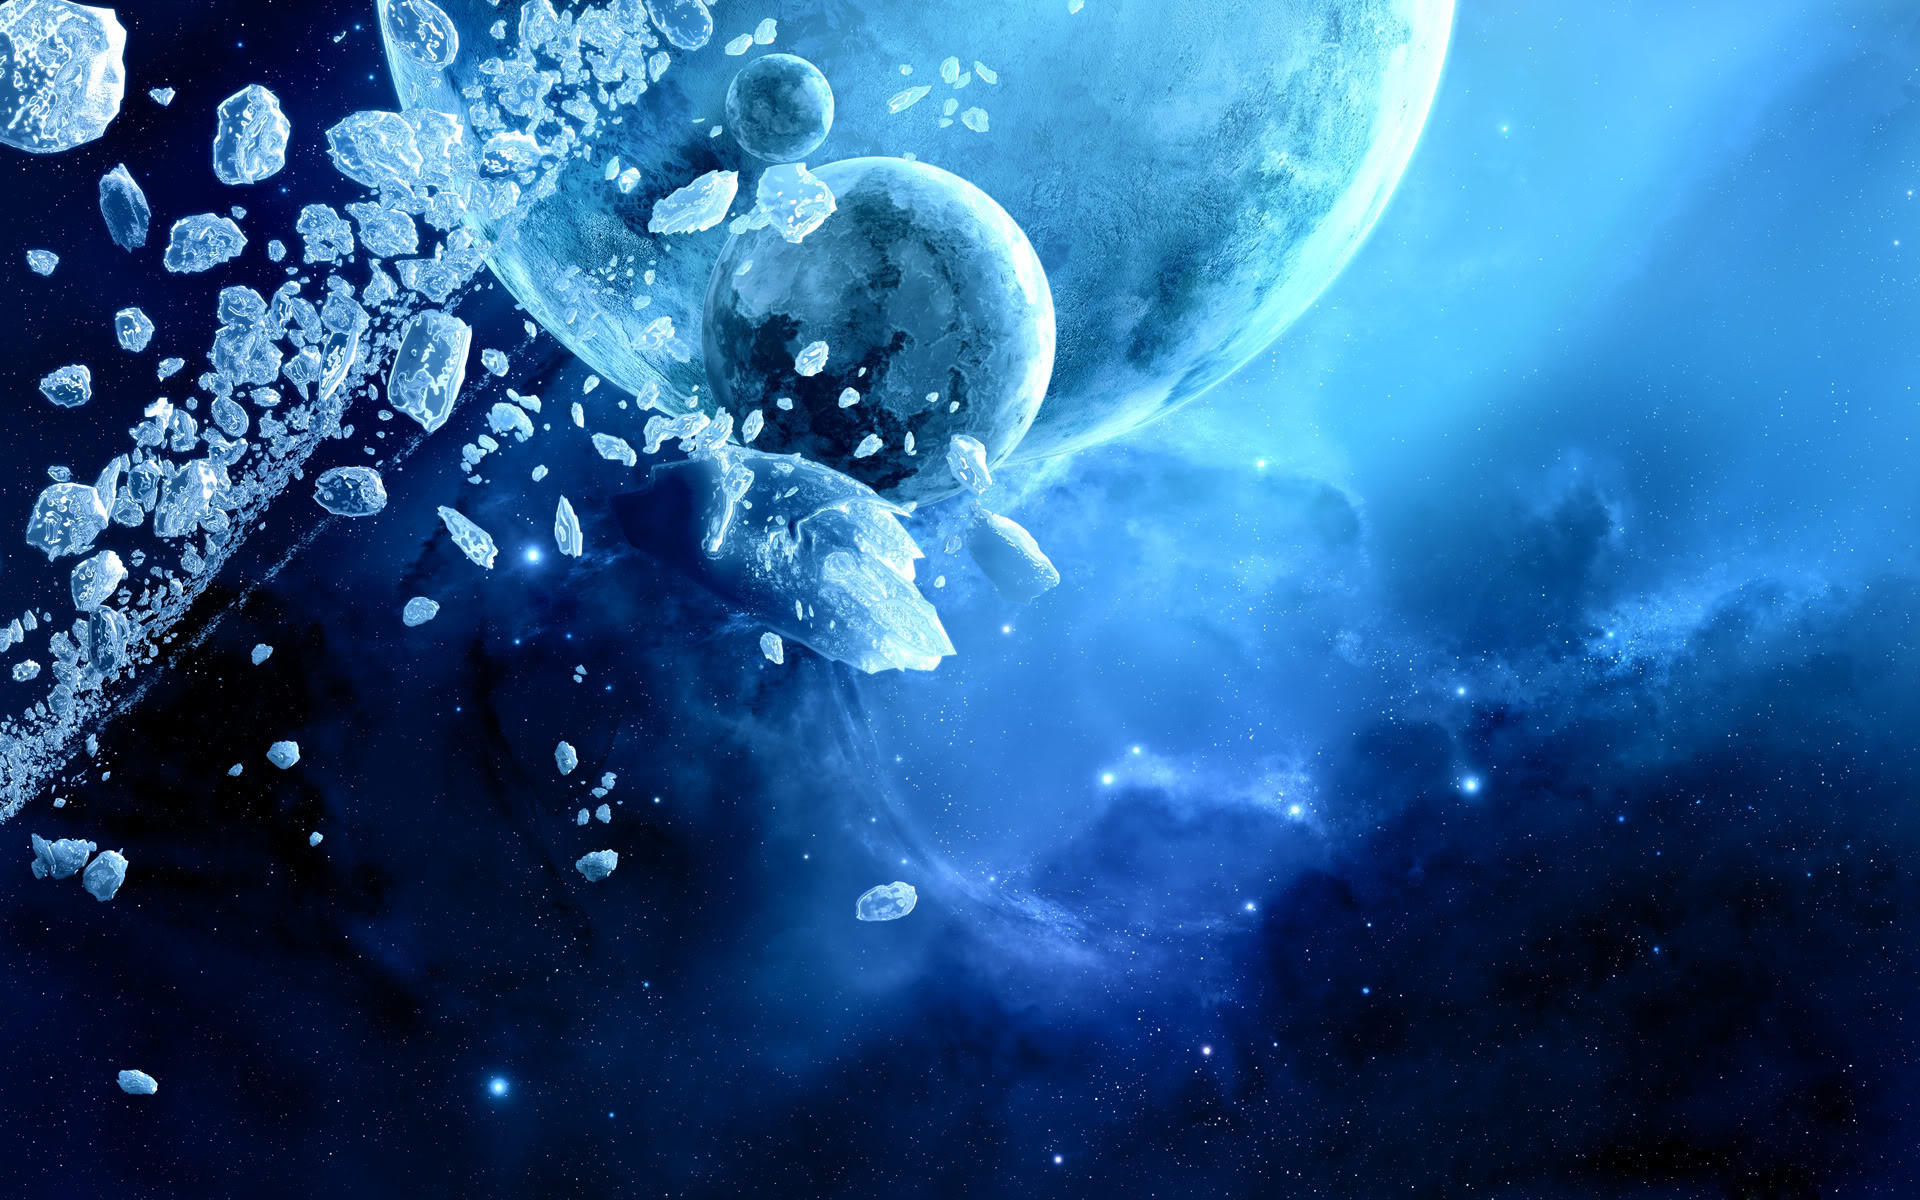 Blue Space Wallpaper 5751